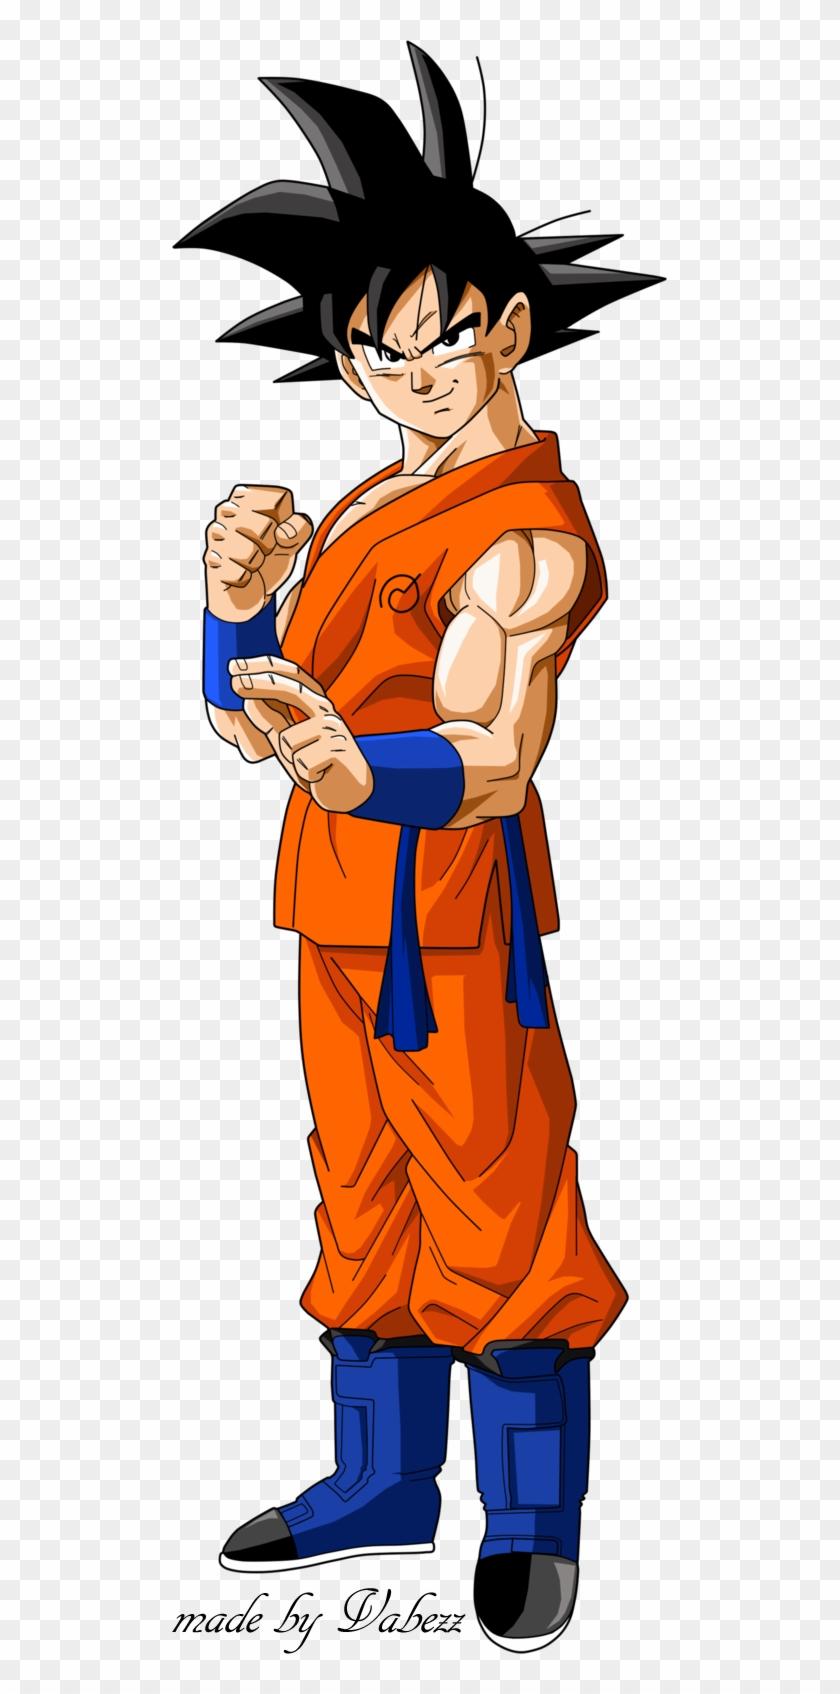 Dragon Ball Super Png Photo - Dragonball Z Son Goku Clipart #504659